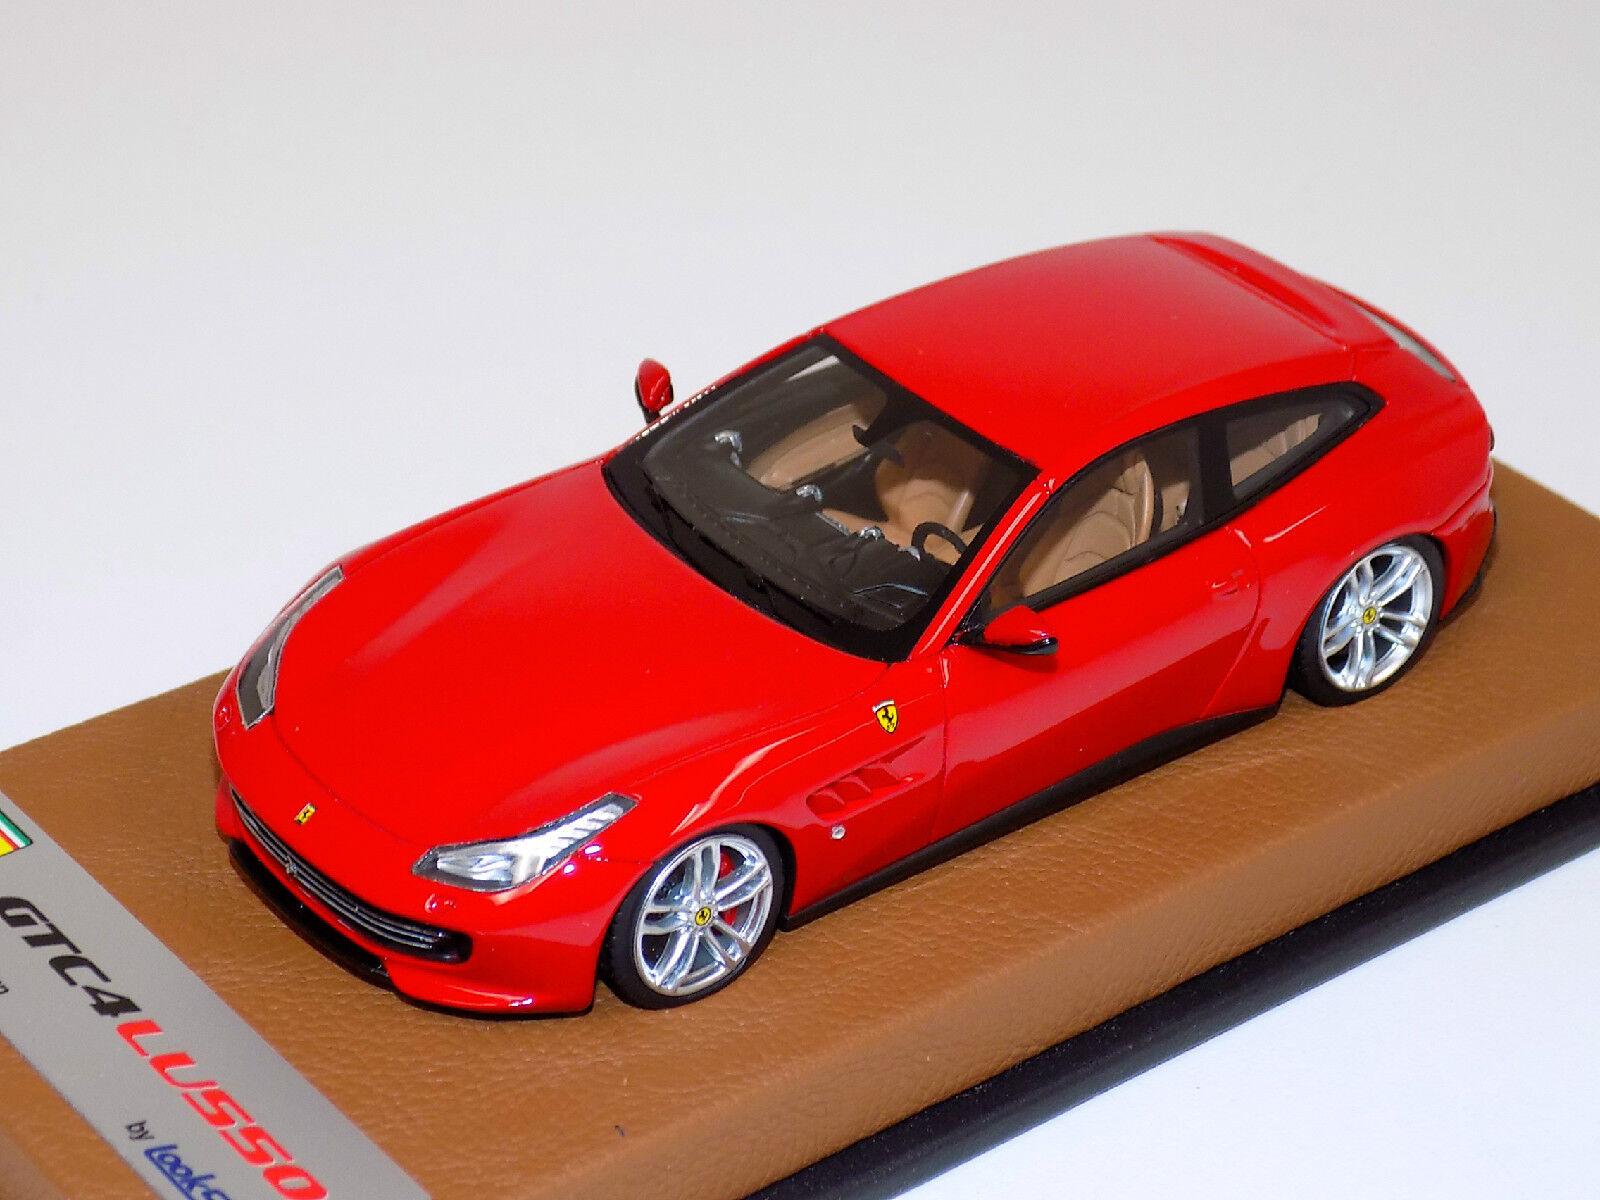 1 43 Looksmart Ferrari GTC4 Lusso in rouge Corsa on Tan Leather Base